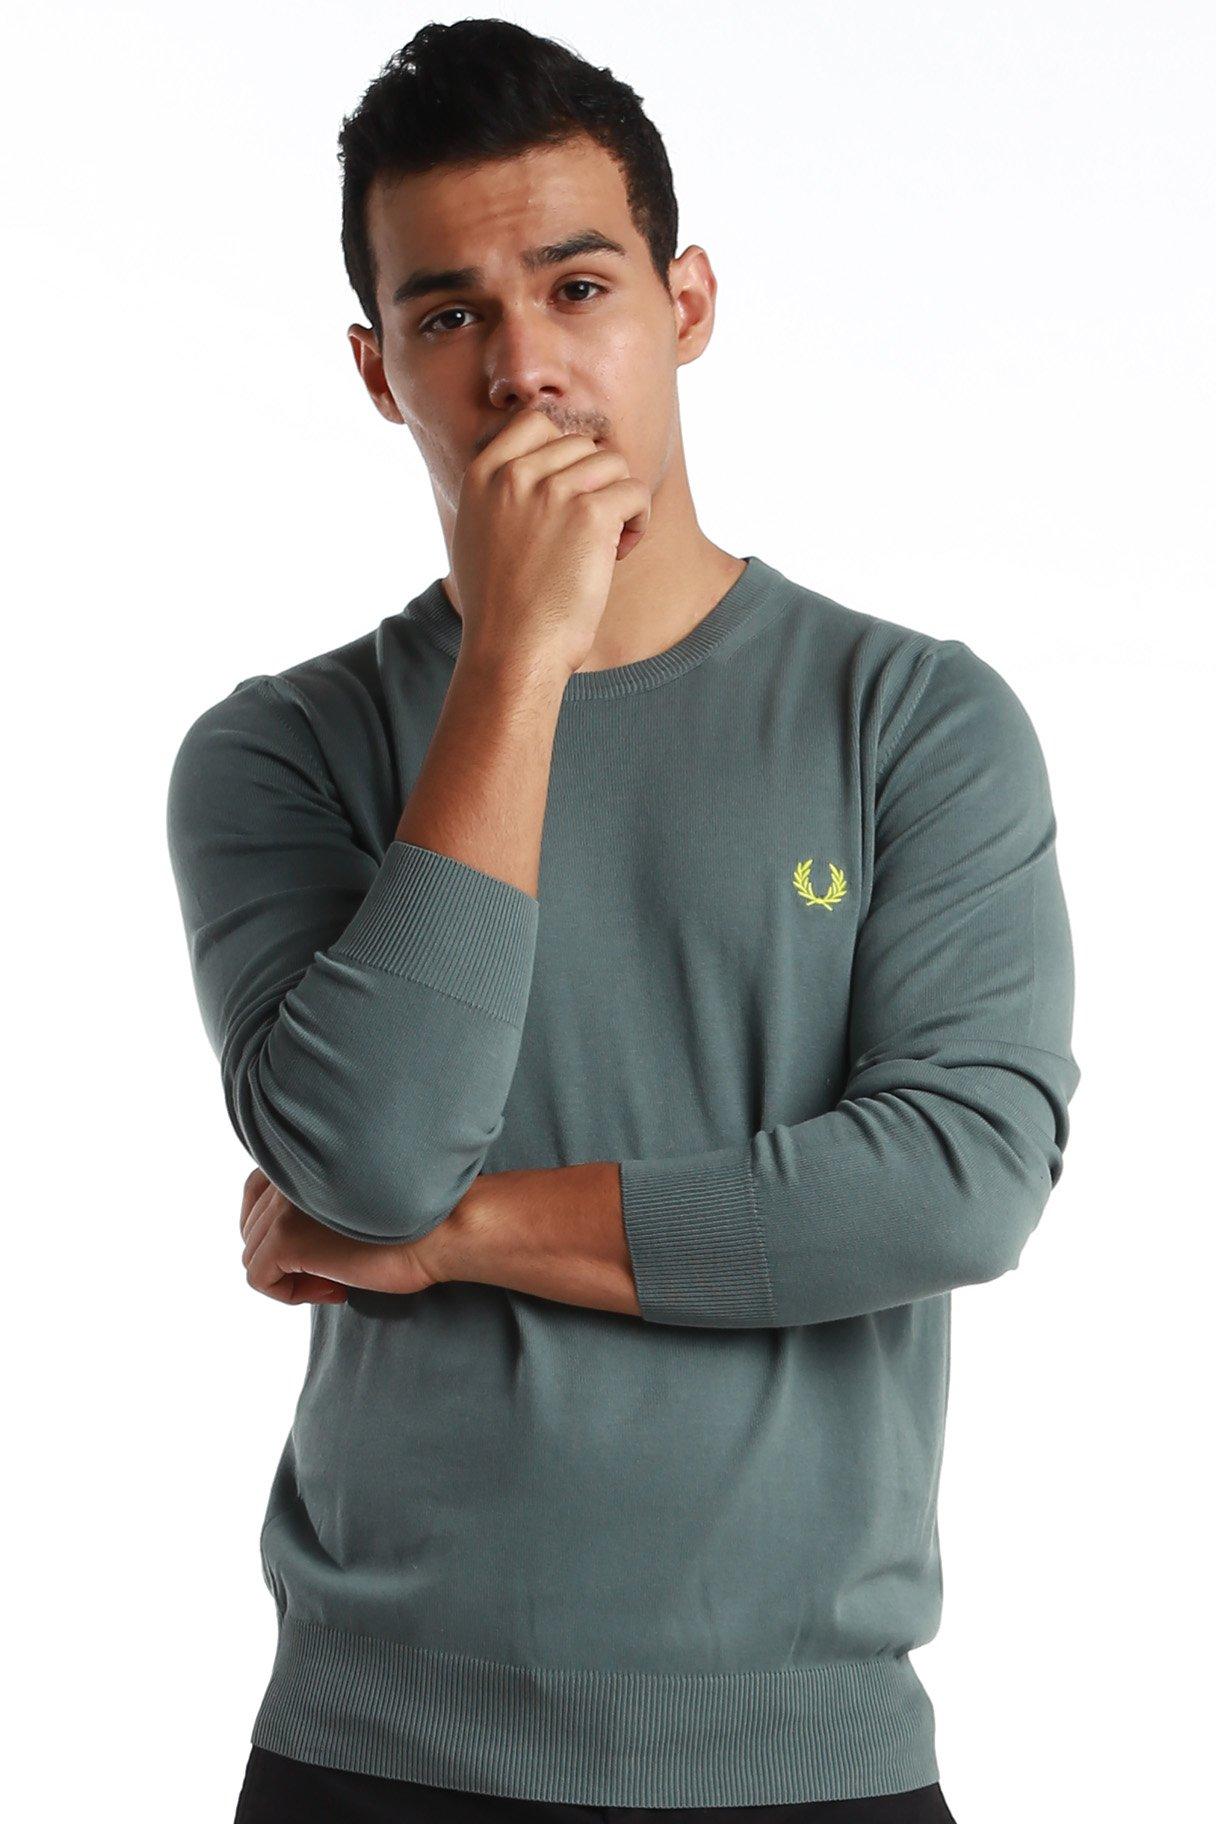 Fred Perry Green Label Men's Sweatshirt Medium Leaf Grey Crew Neck Sweatshirt with Yellow ''laurel''